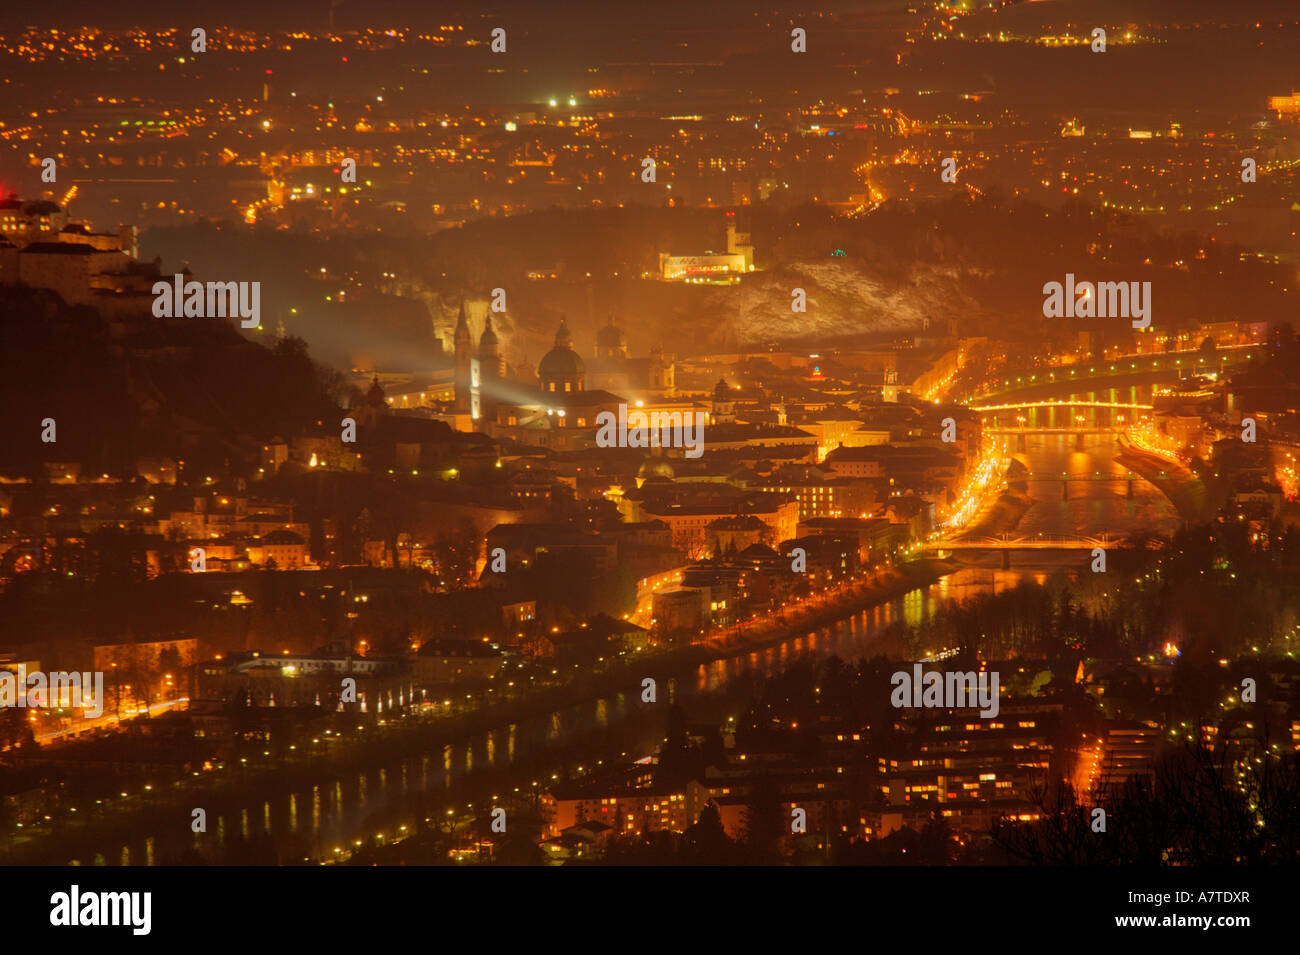 Aerial view of cityscape lit up at night, Salzach River, Salzburg, Austria Stock Photo